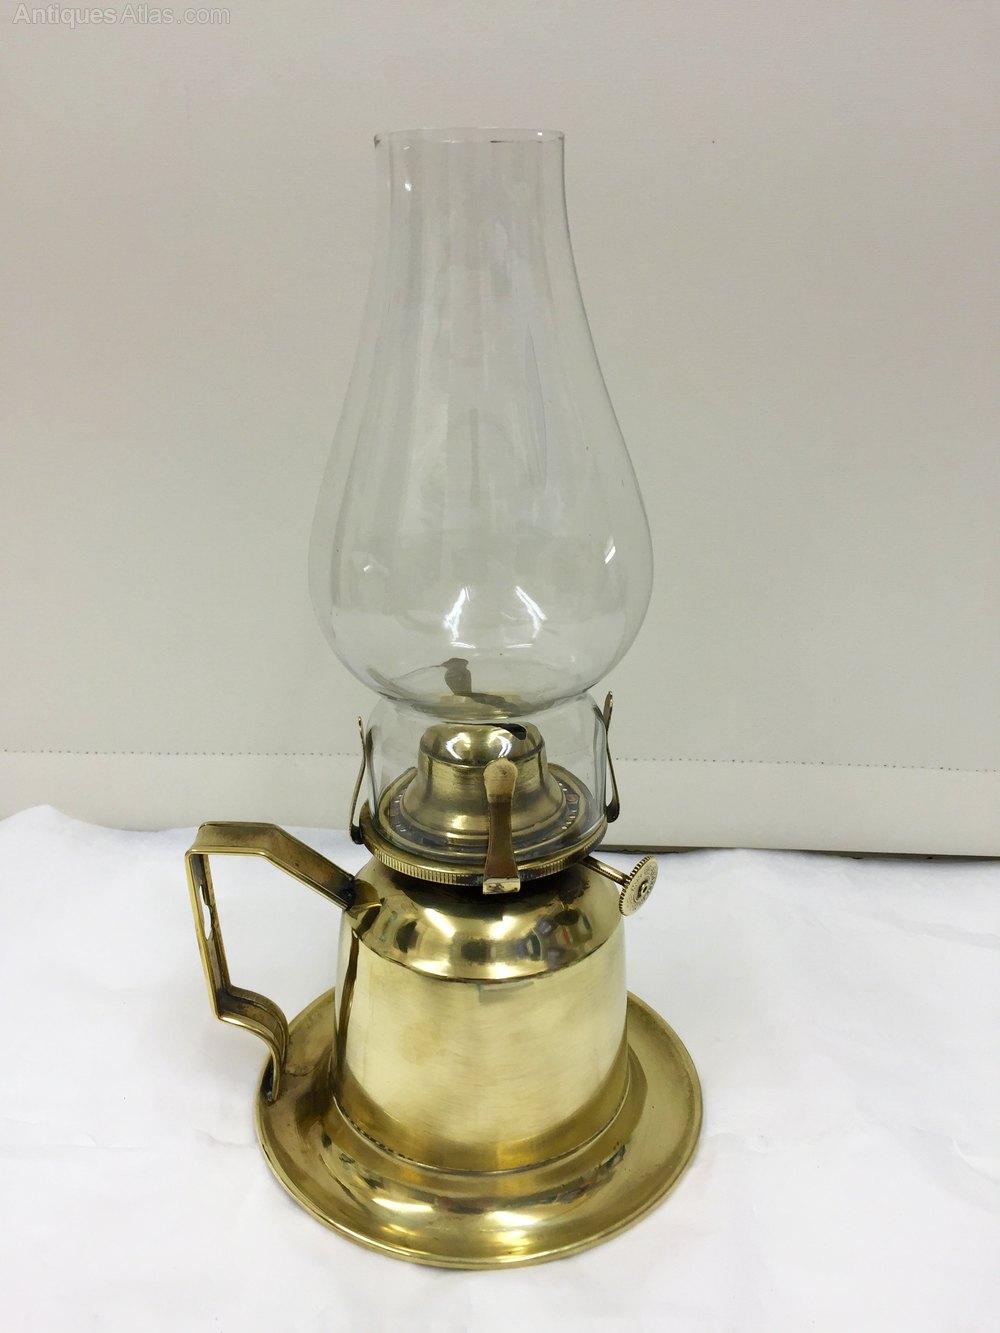 Antiques Atlas Antique Brass Chamber Oil Lamp Circa 1885